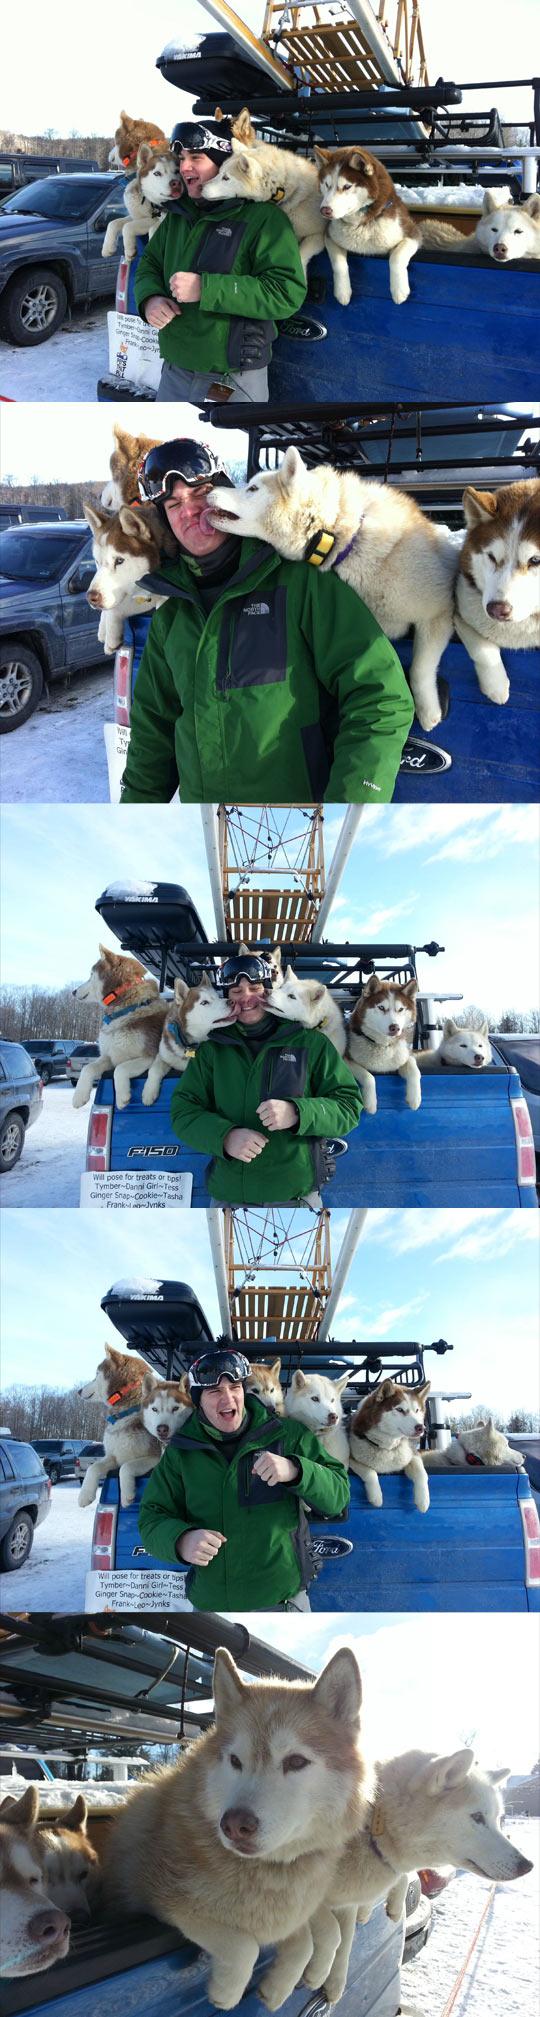 funny-sled-dog-Husky-licking-truck